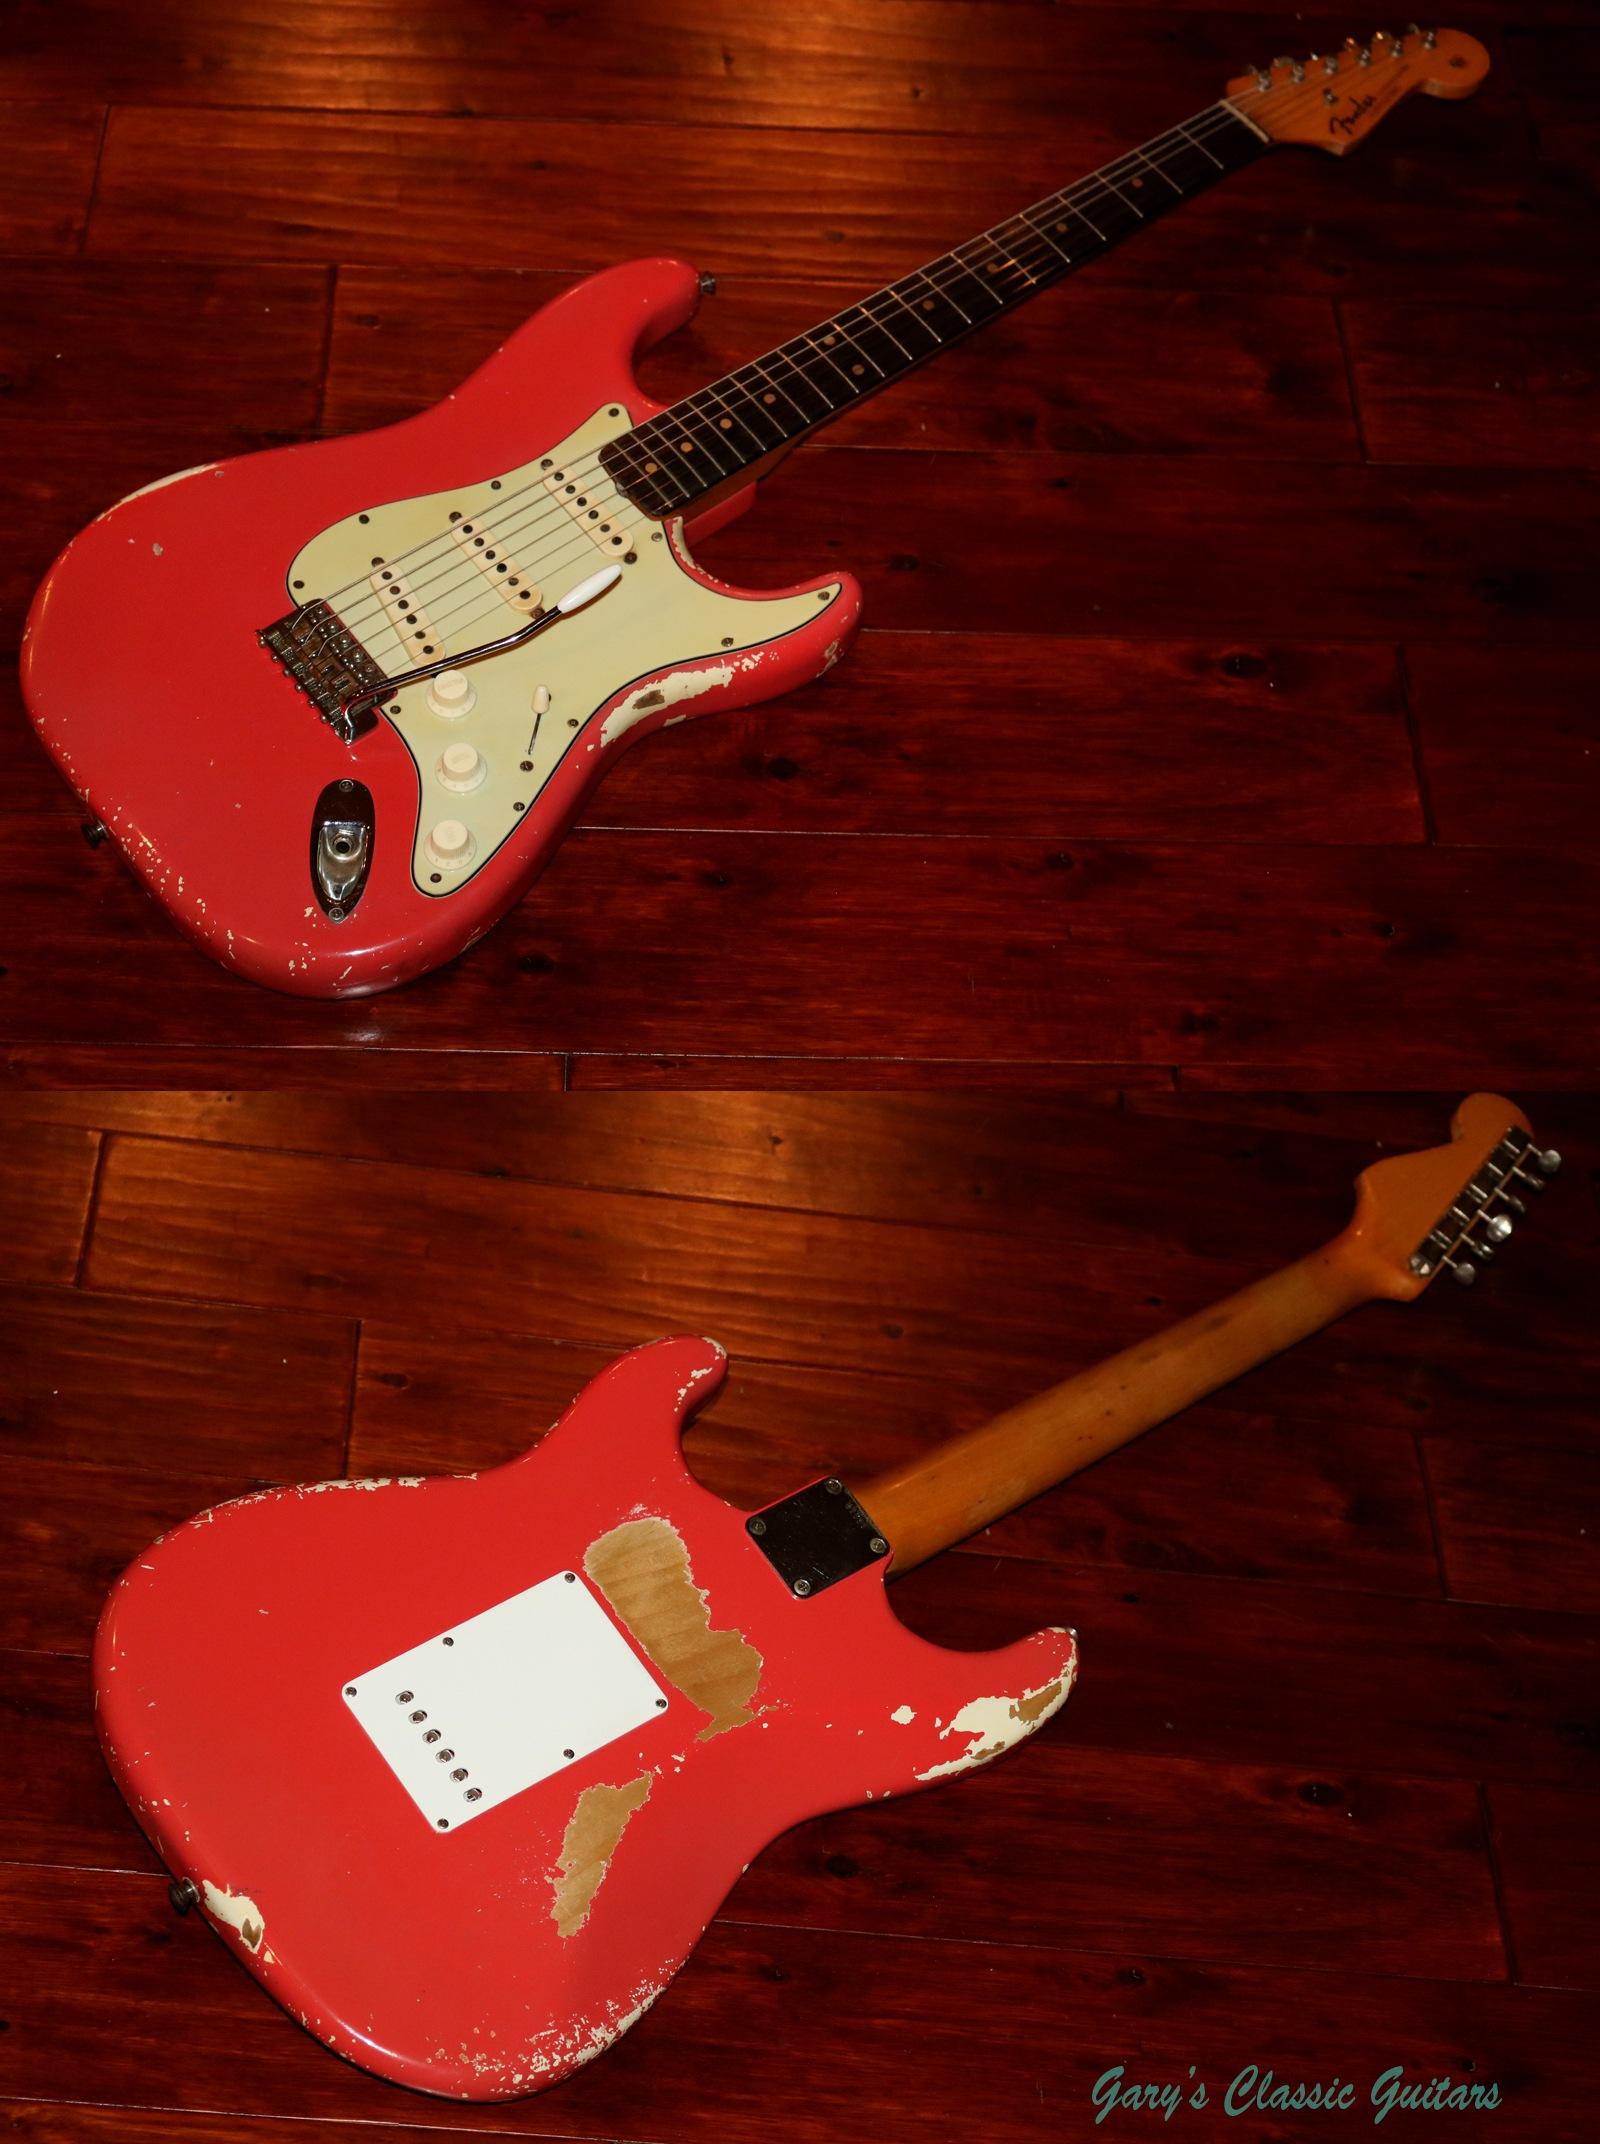 1963 Fender Stratocaster, Original Fiesta Red finish | Garys